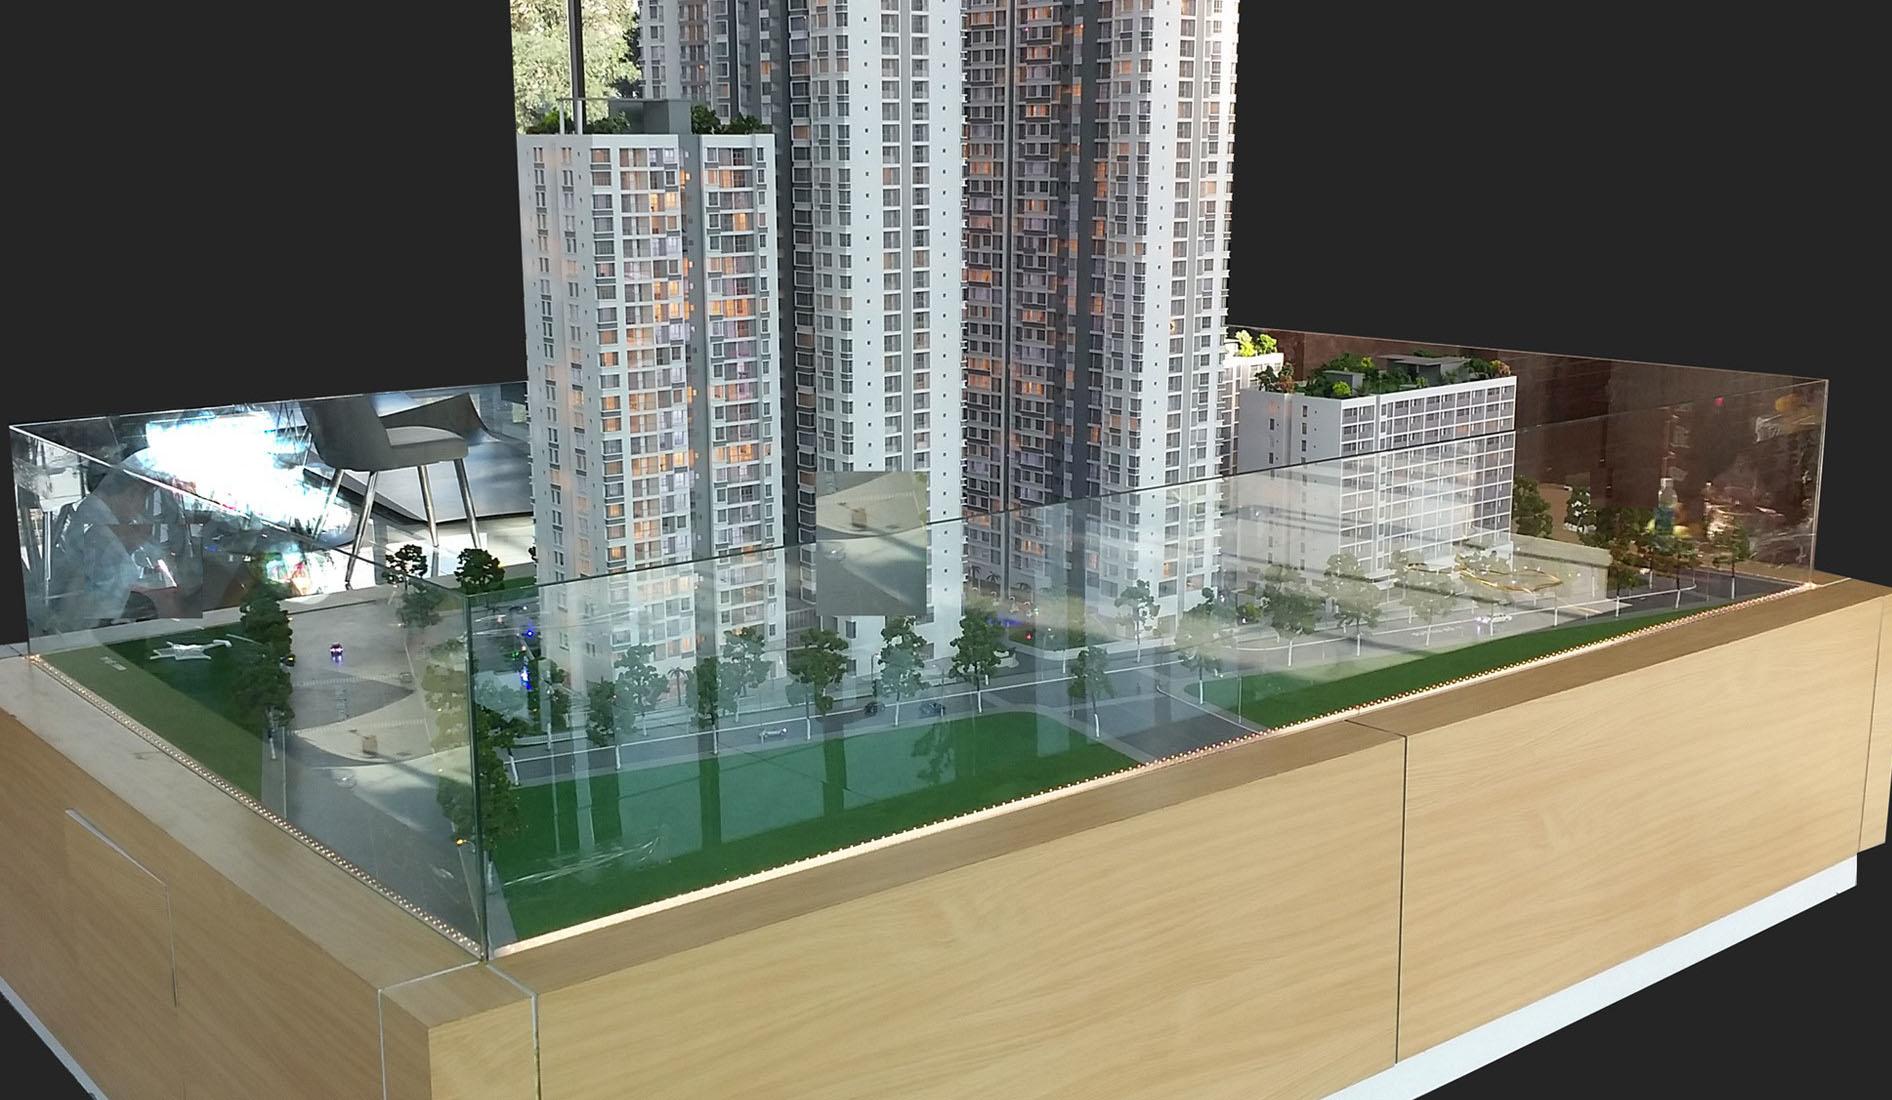 Tổ hợp the Capital quận 6 - CTY CP đầu tư Eximbank